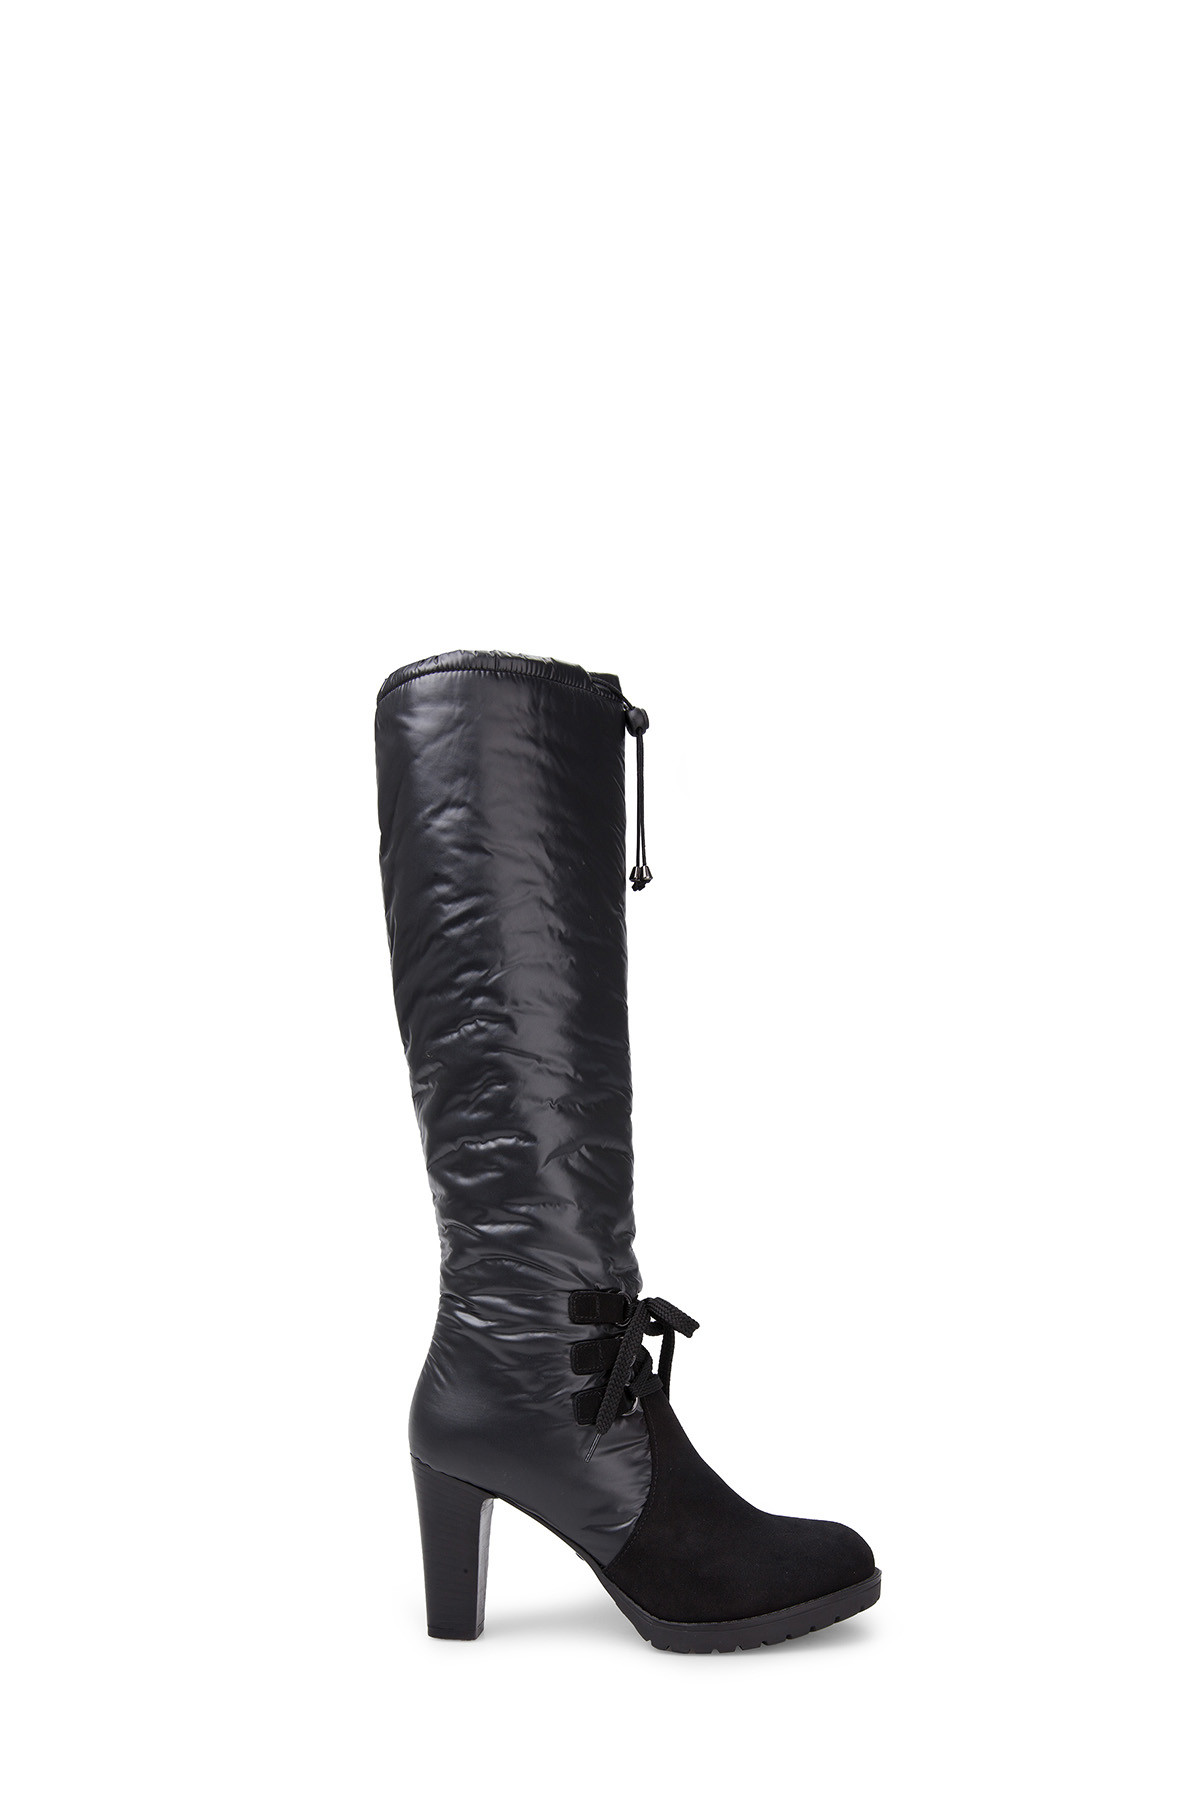 ALBERTO GUARDIANI Kadın Siyah Çizme ZOXSD47397 1